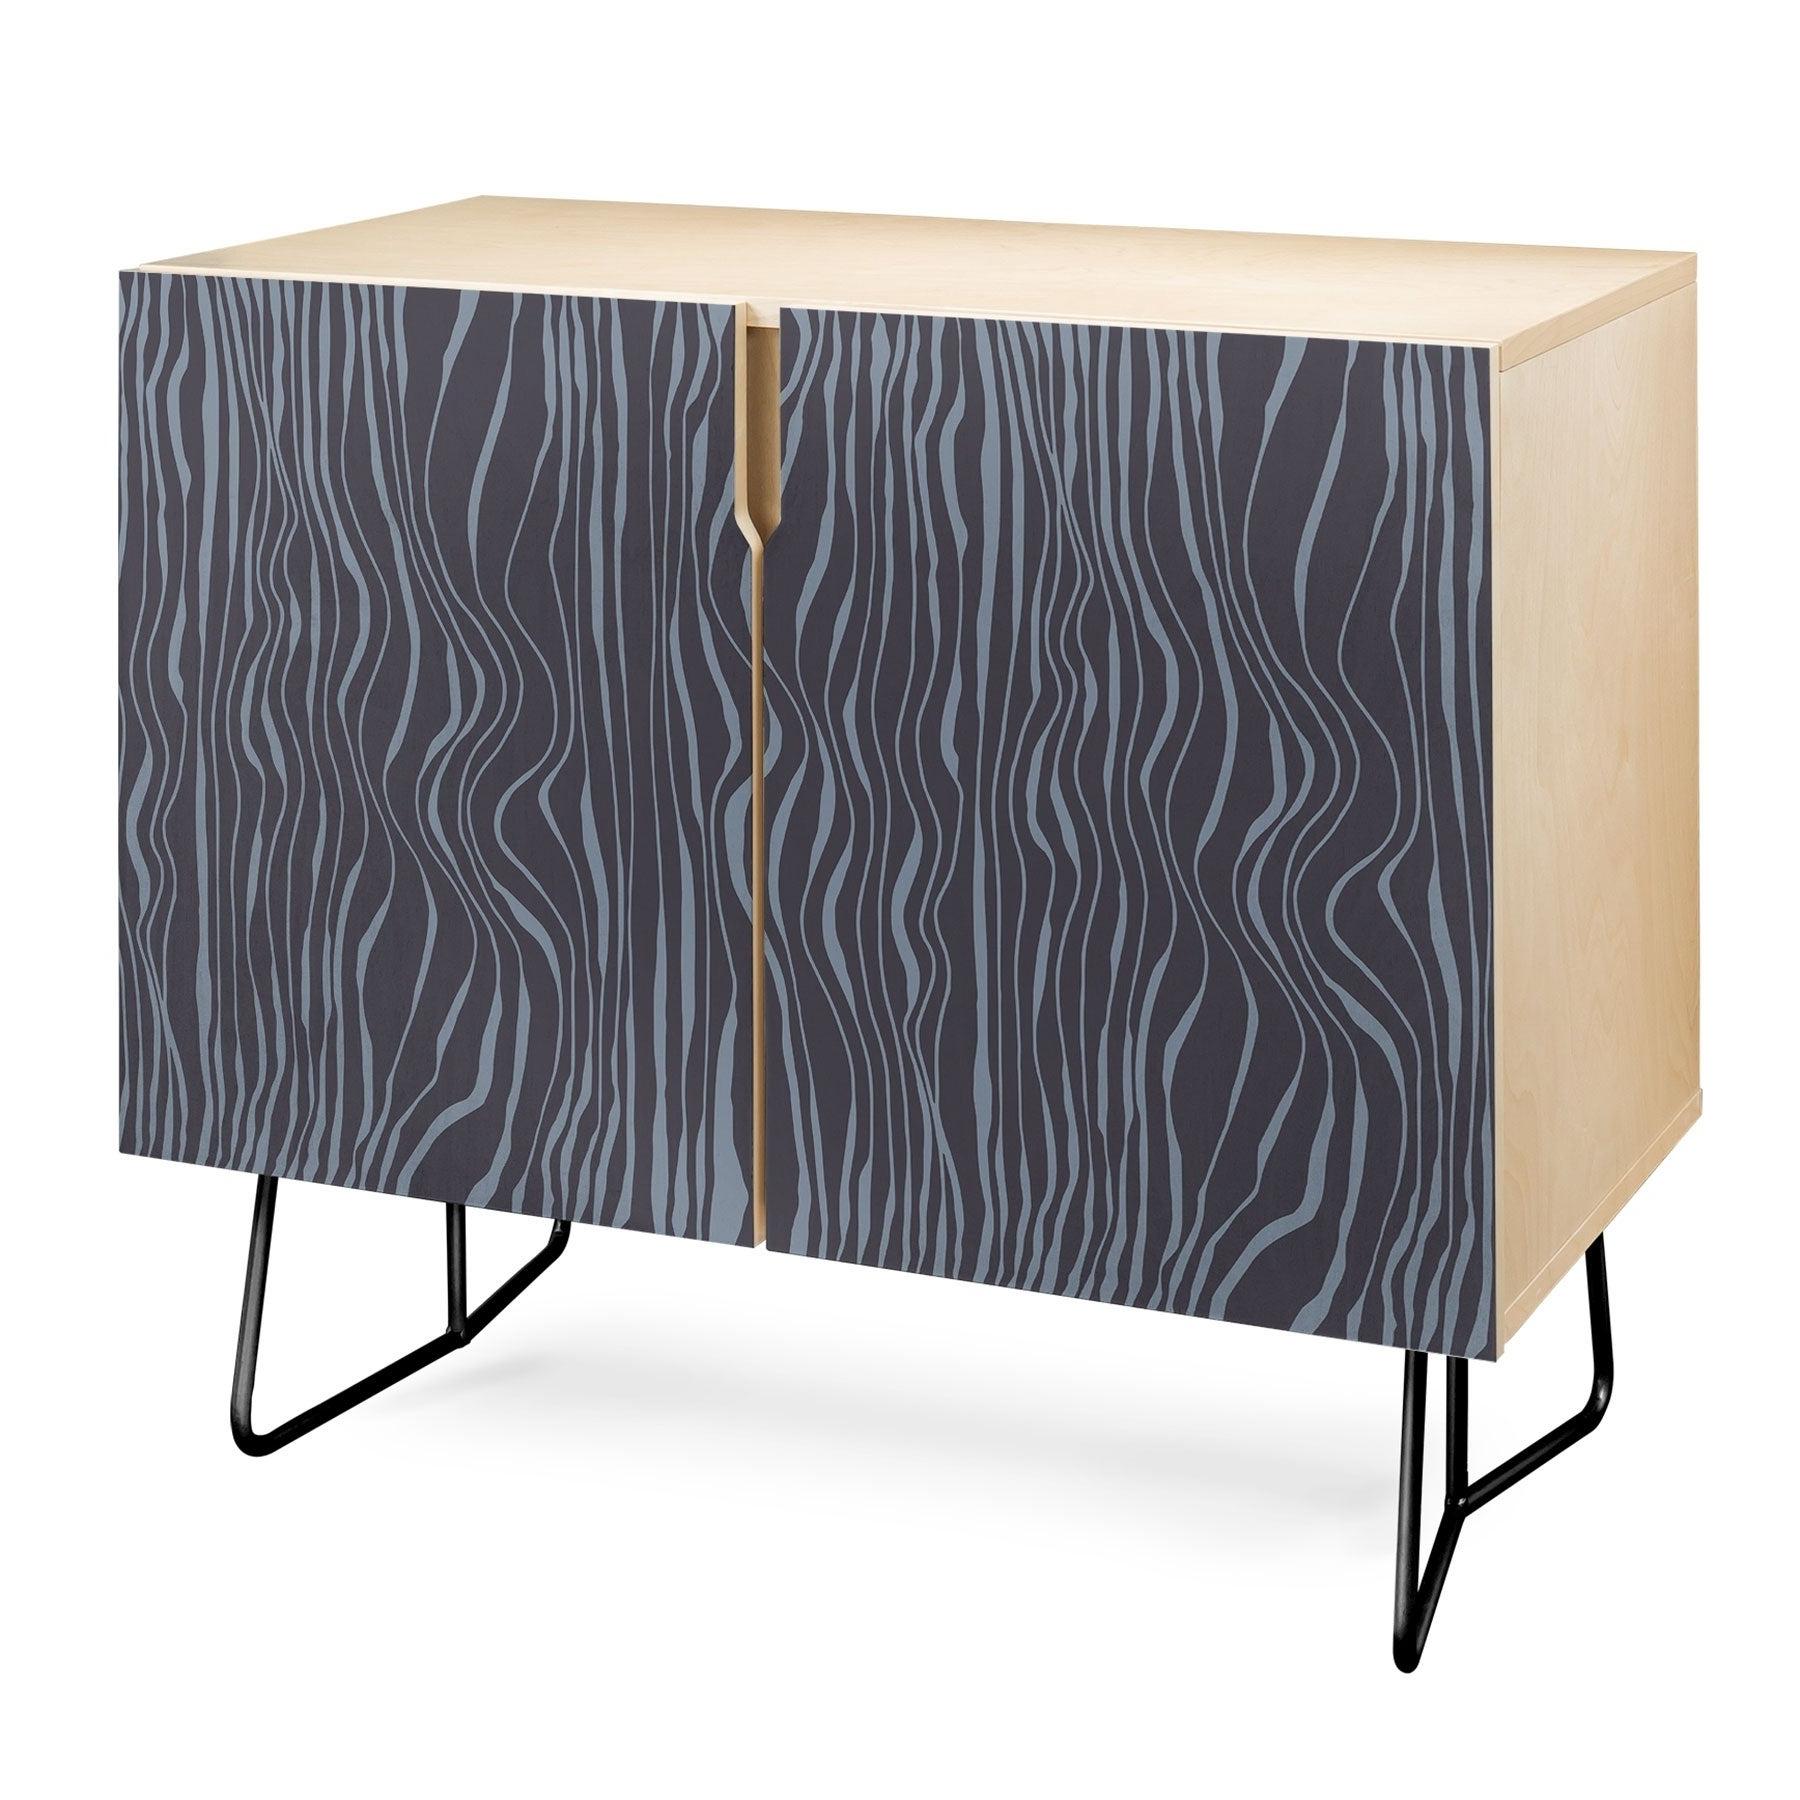 Deny Designs Wavy Stripes Credenza (birch Or Walnut, 2 Leg Options) Within Multi Stripe Credenzas (View 12 of 20)